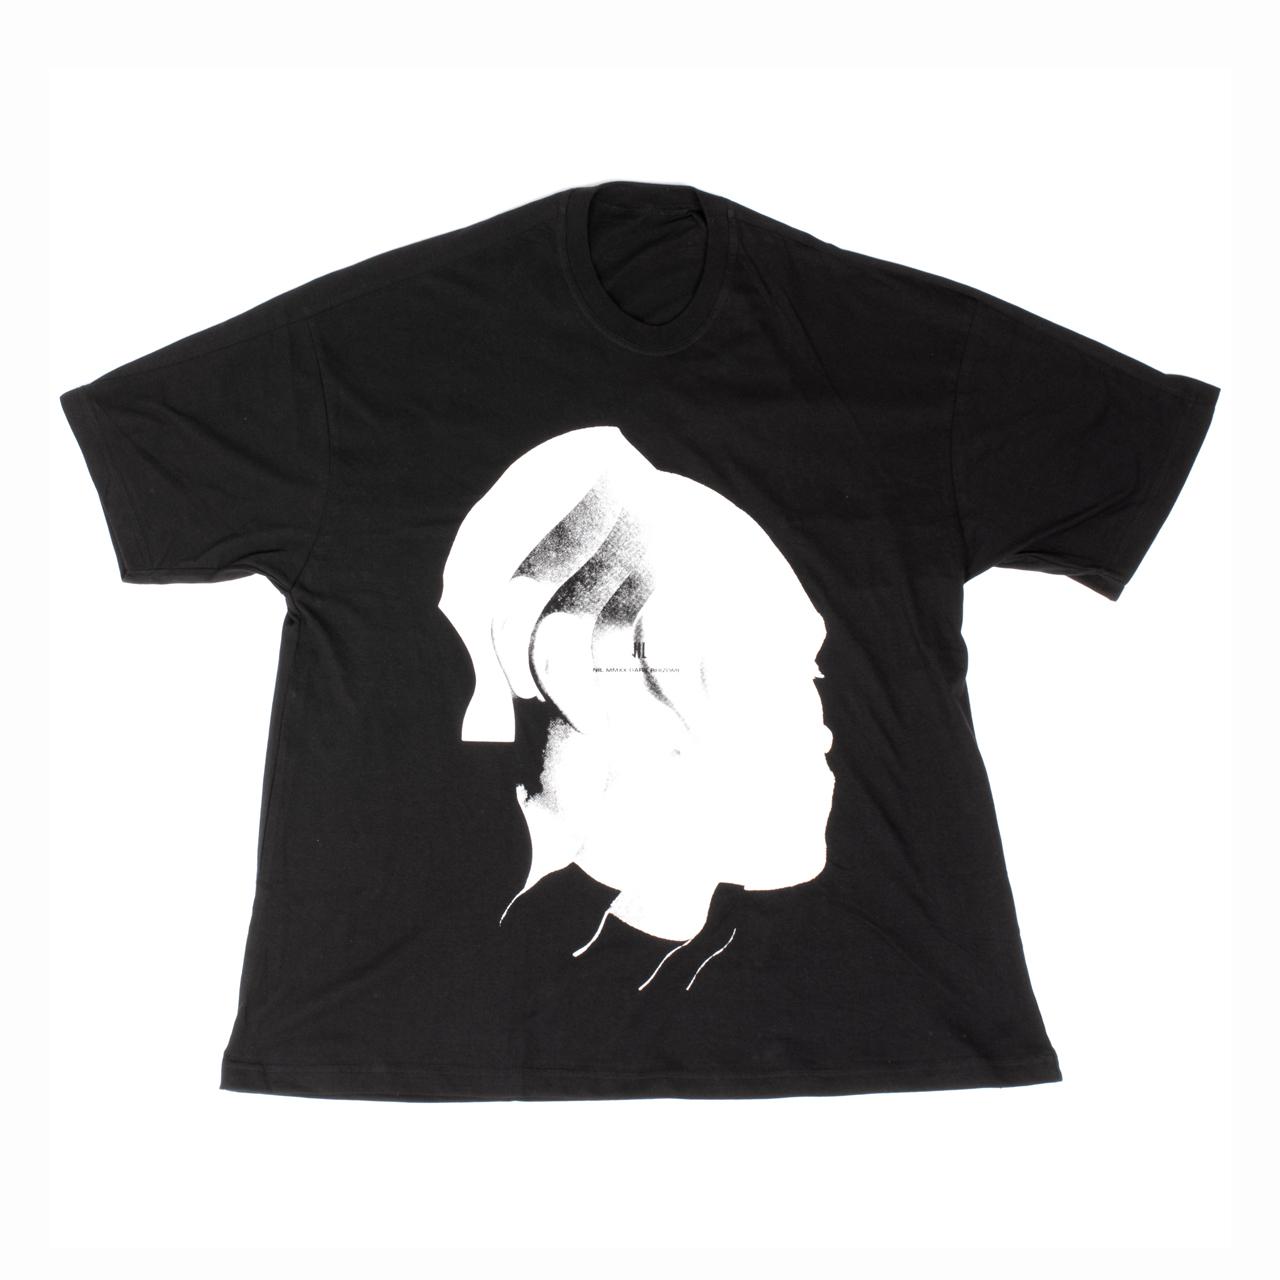 701CPM11-BLACK / Jesse Draxler プリント Tシャツ ver.1